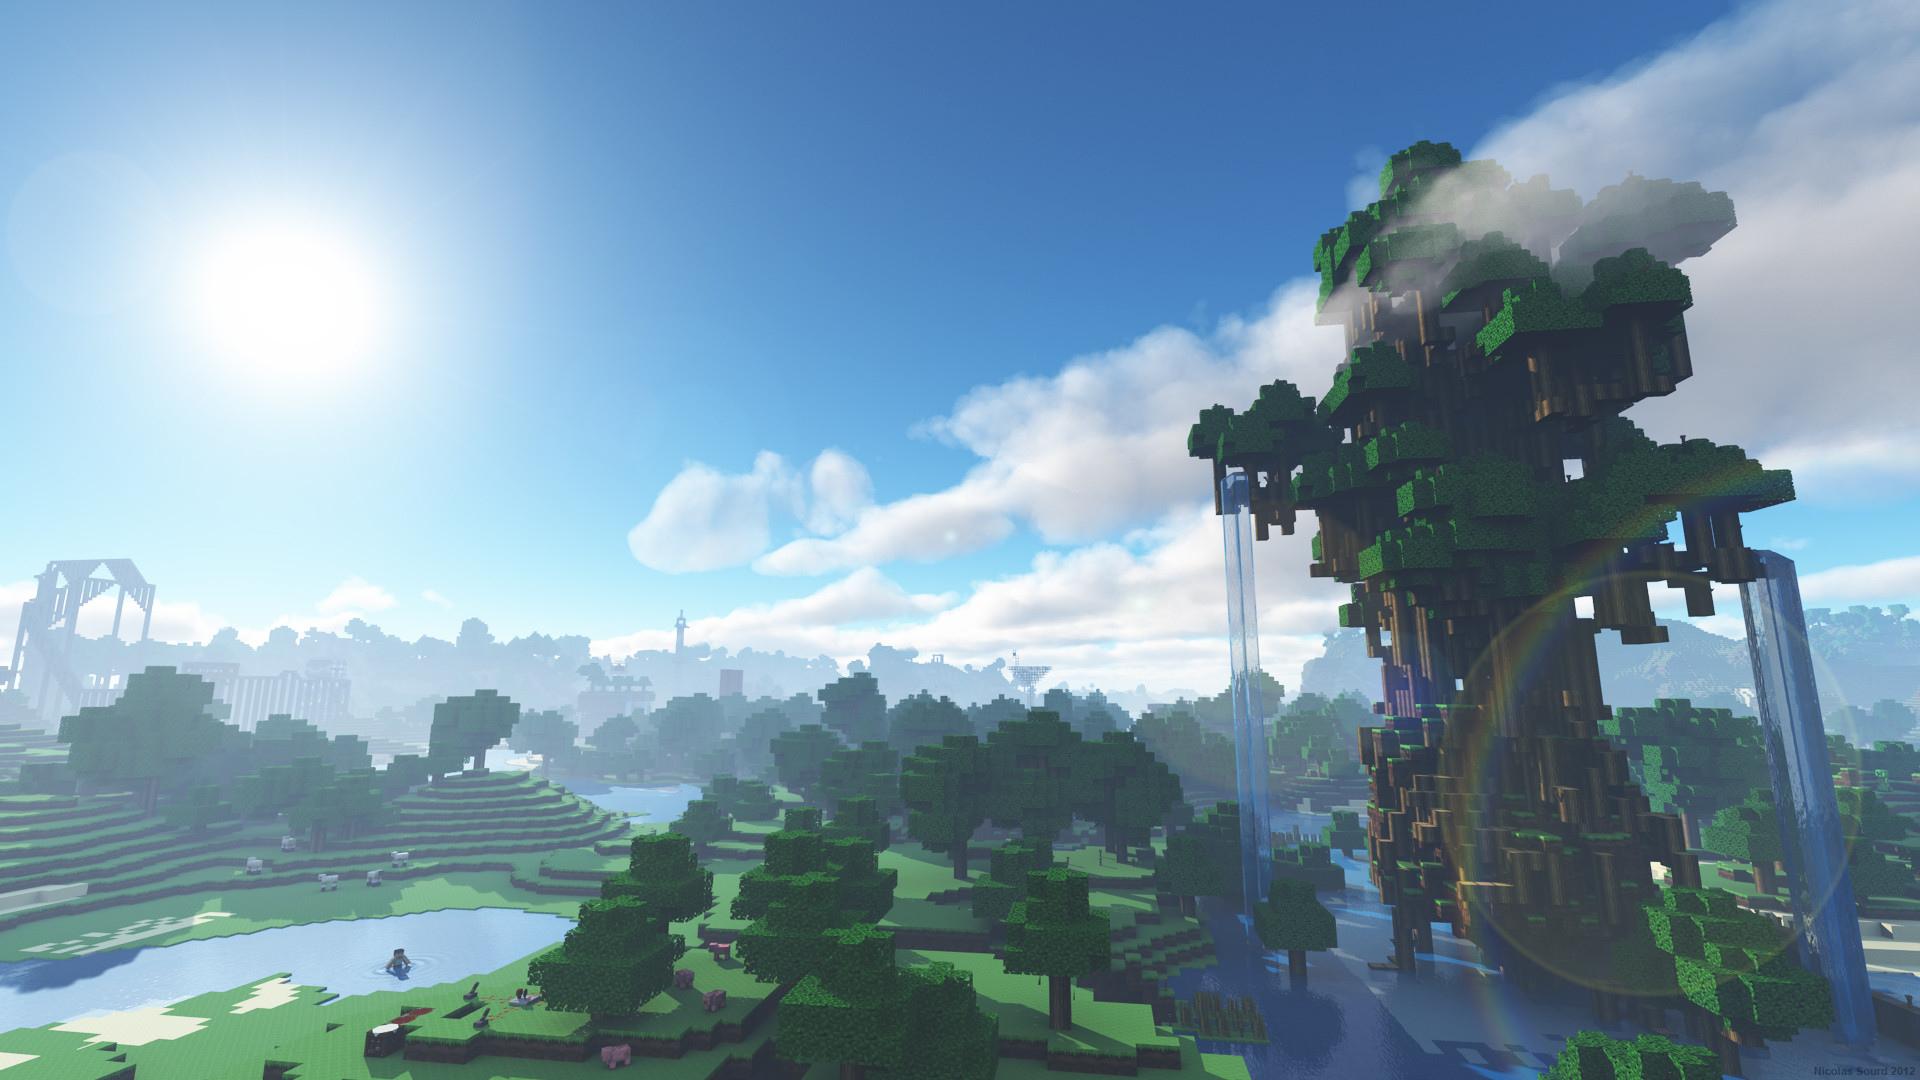 Fondos De Pantalla De Minecraft, Wallpapers HD E Imágenes